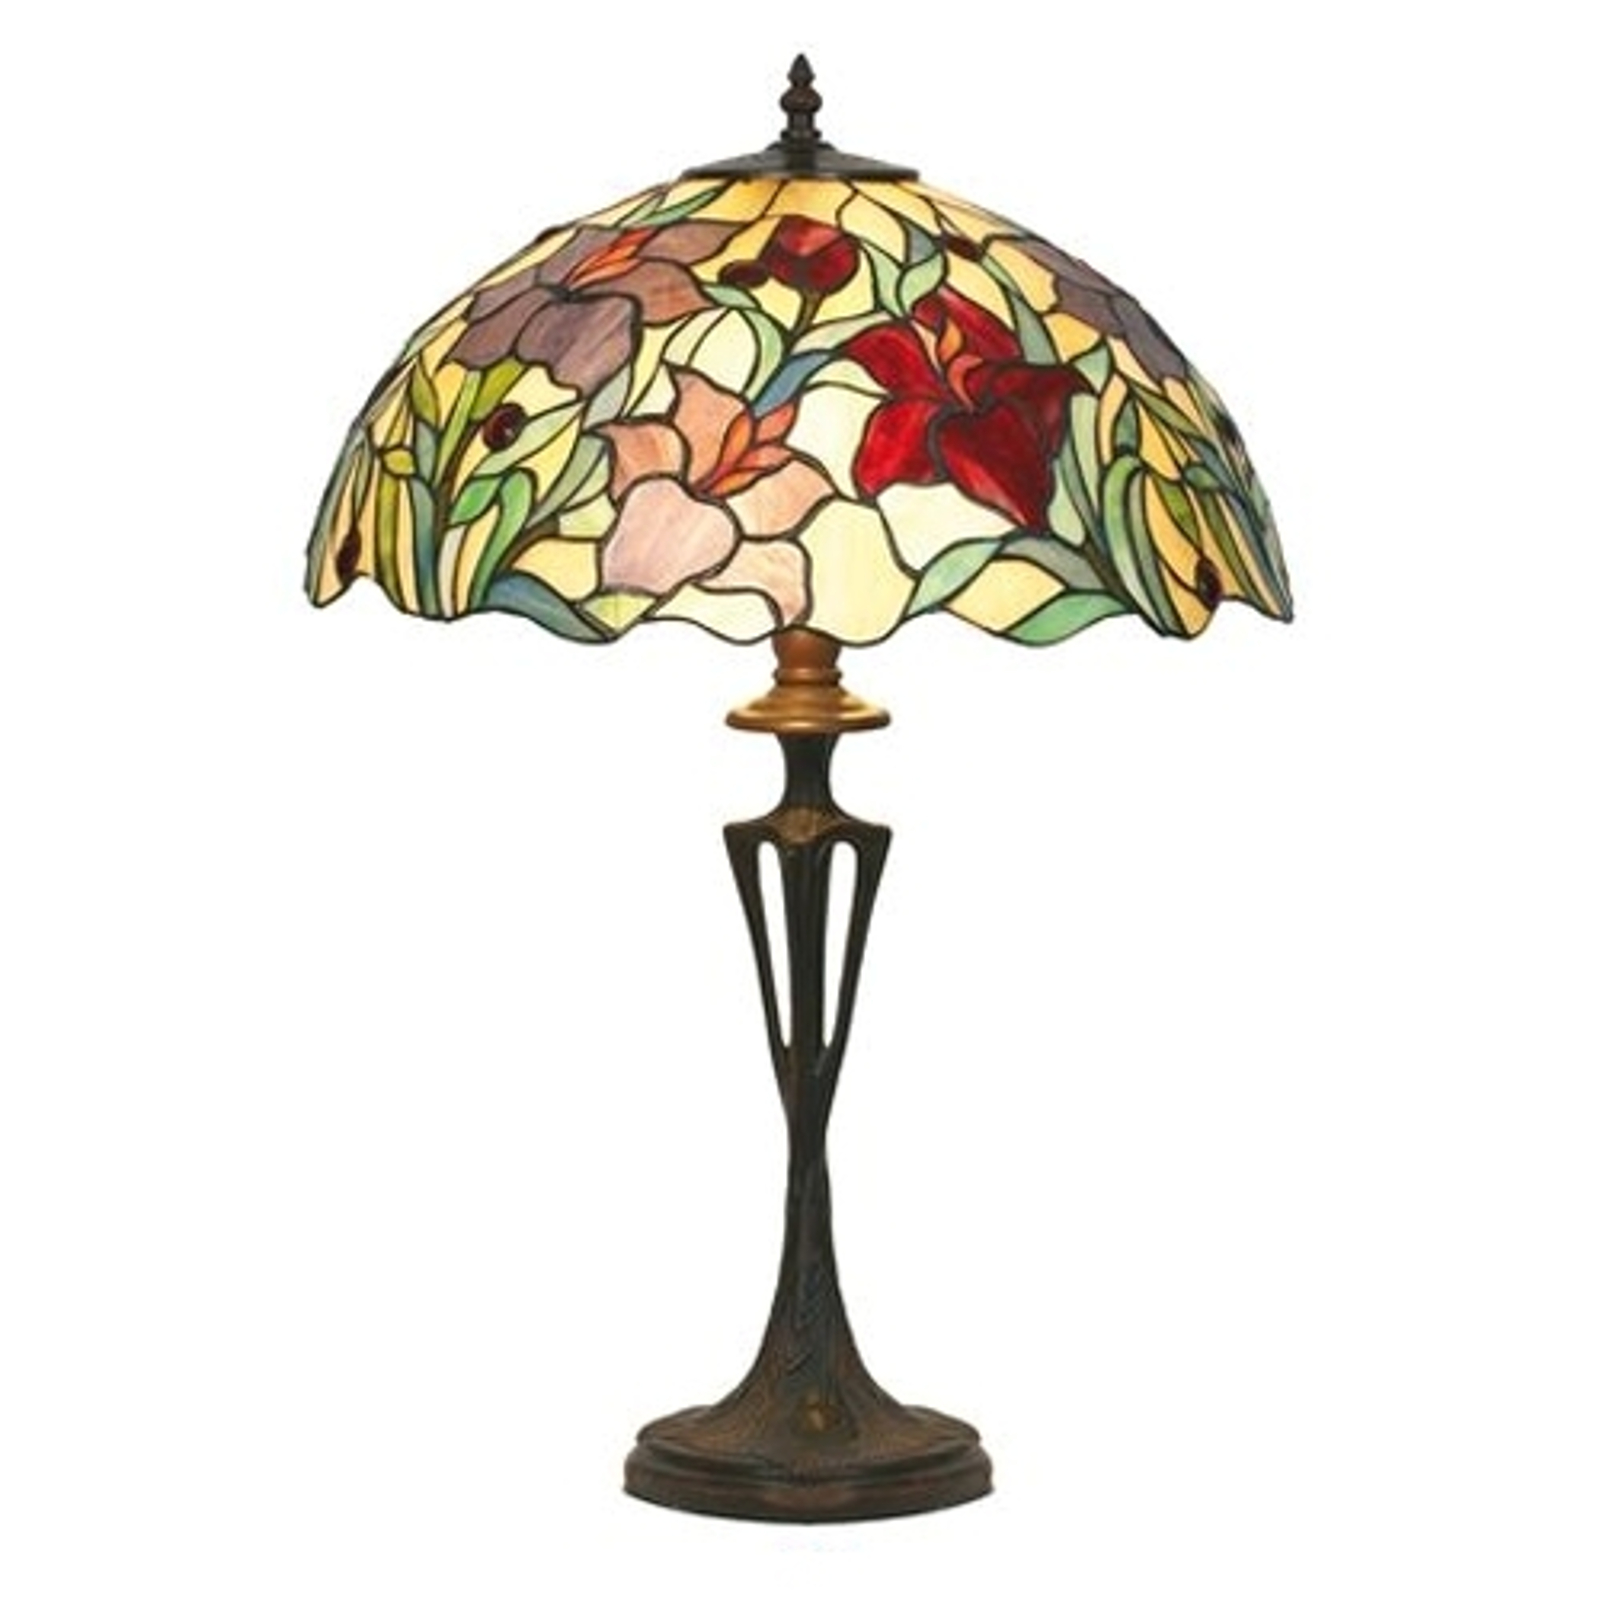 Lampada da tavolo Athina in stile Tiffany